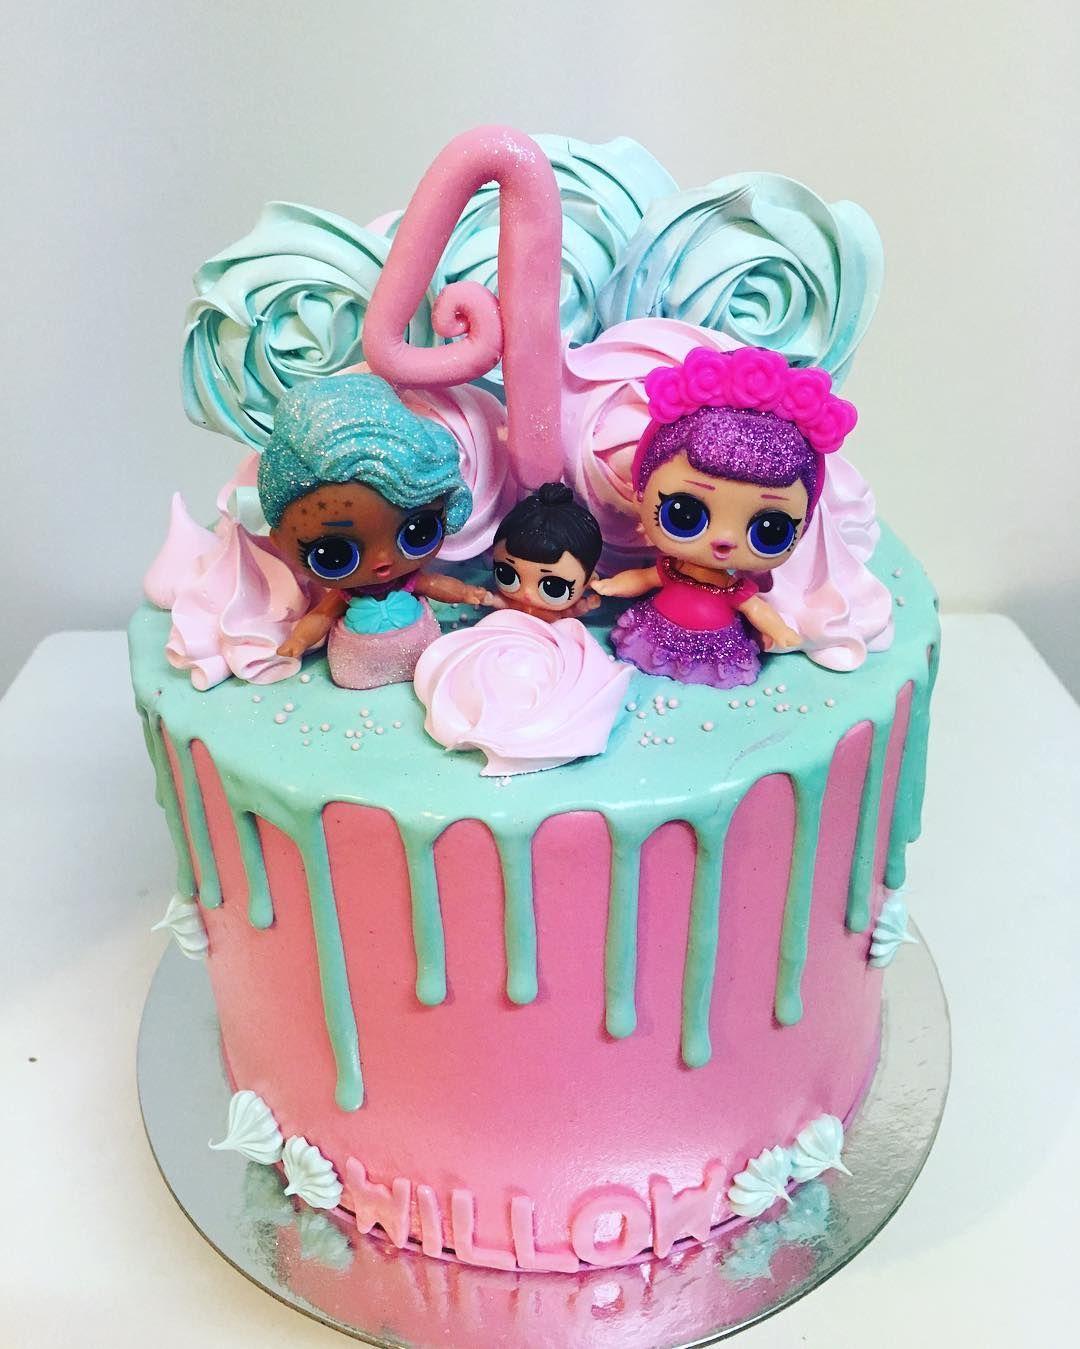 Candy Melt Cake Design Pinterest Candy Melts Cake And Birthdays